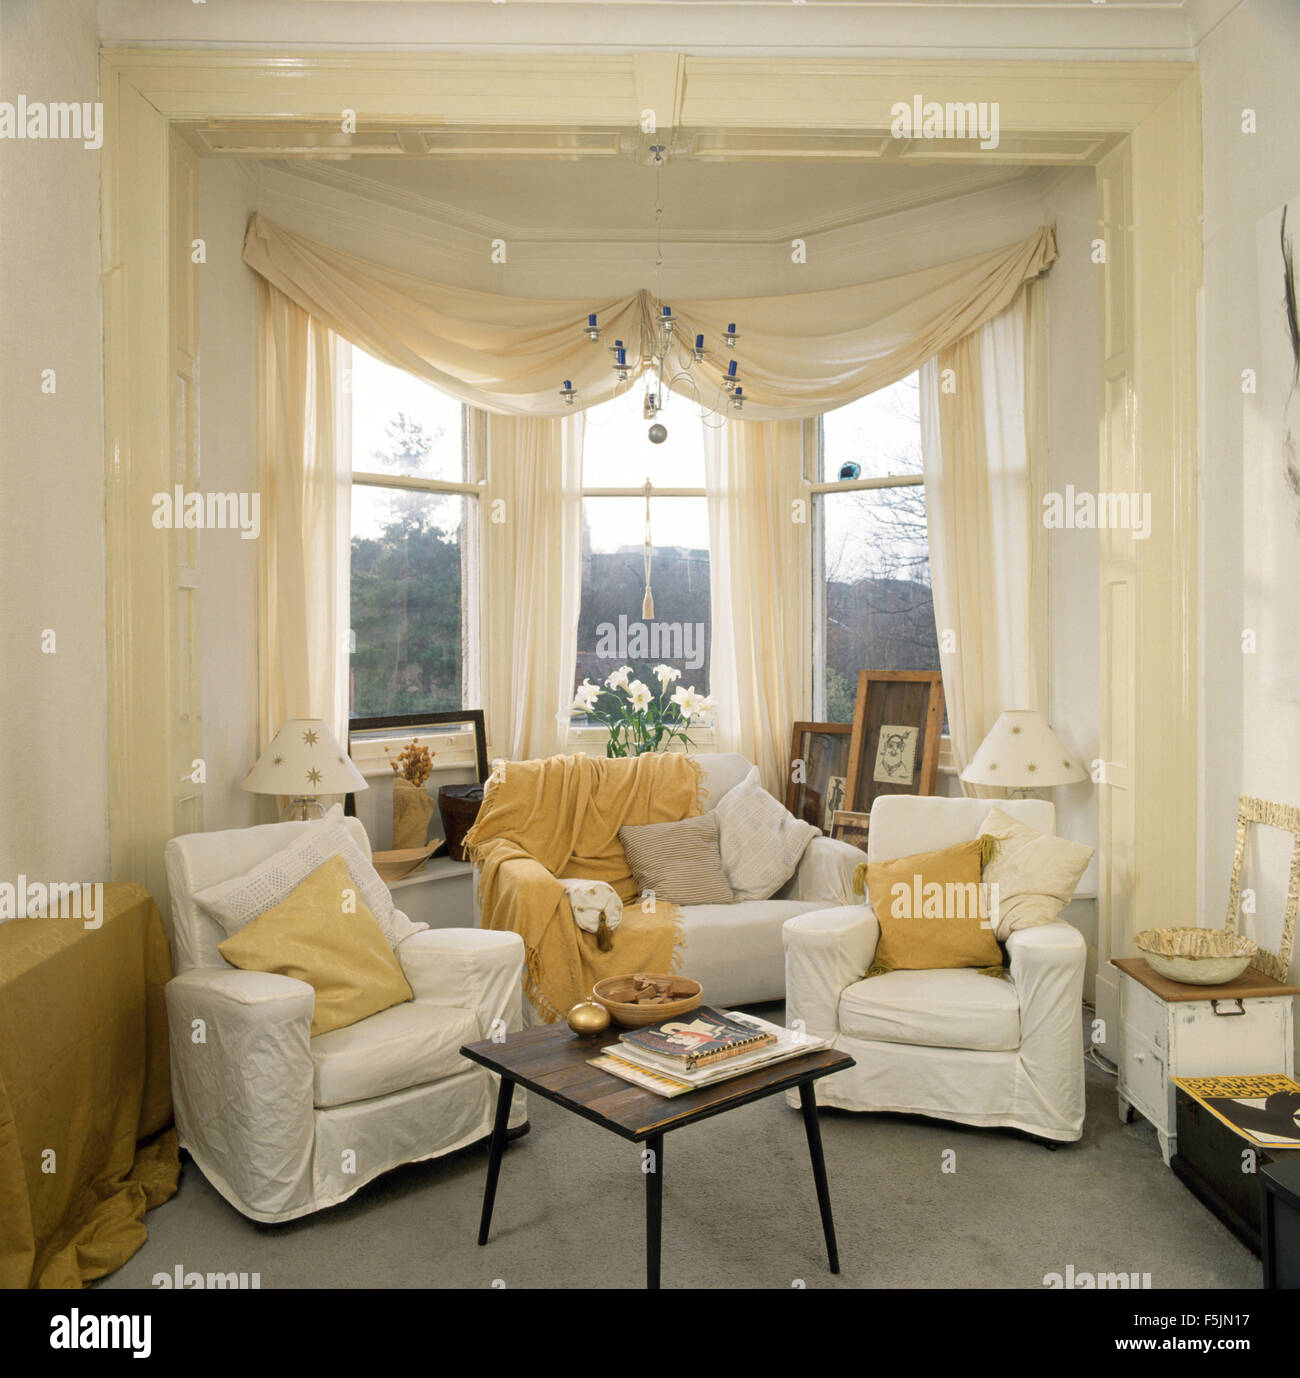 bay window drapes stockfotos bay window drapes bilder alamy. Black Bedroom Furniture Sets. Home Design Ideas